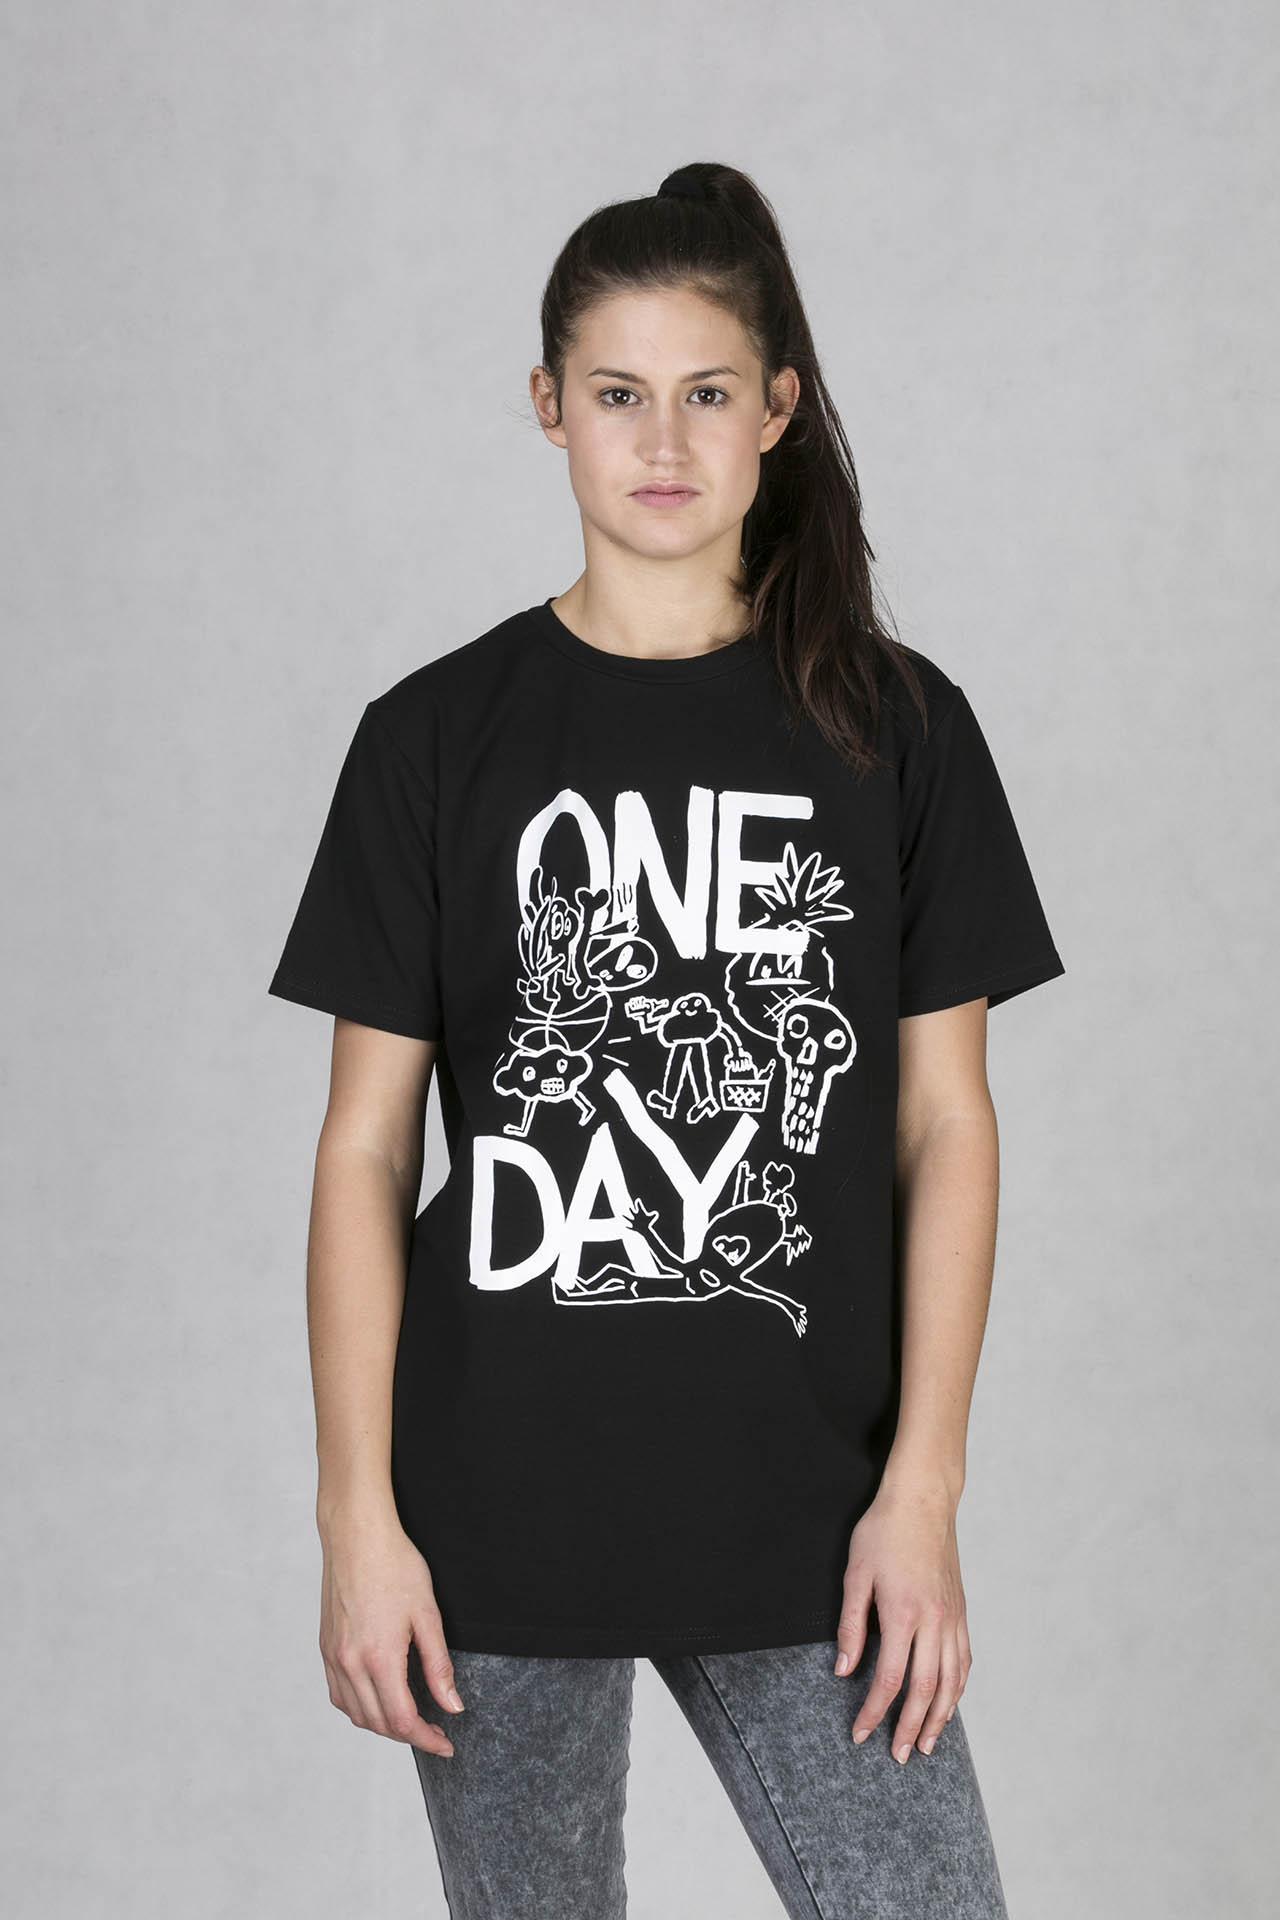 ONEDAY t-shirt boyfriend BULB . Pánské triko s originálním potiskem ... a274be9b6b